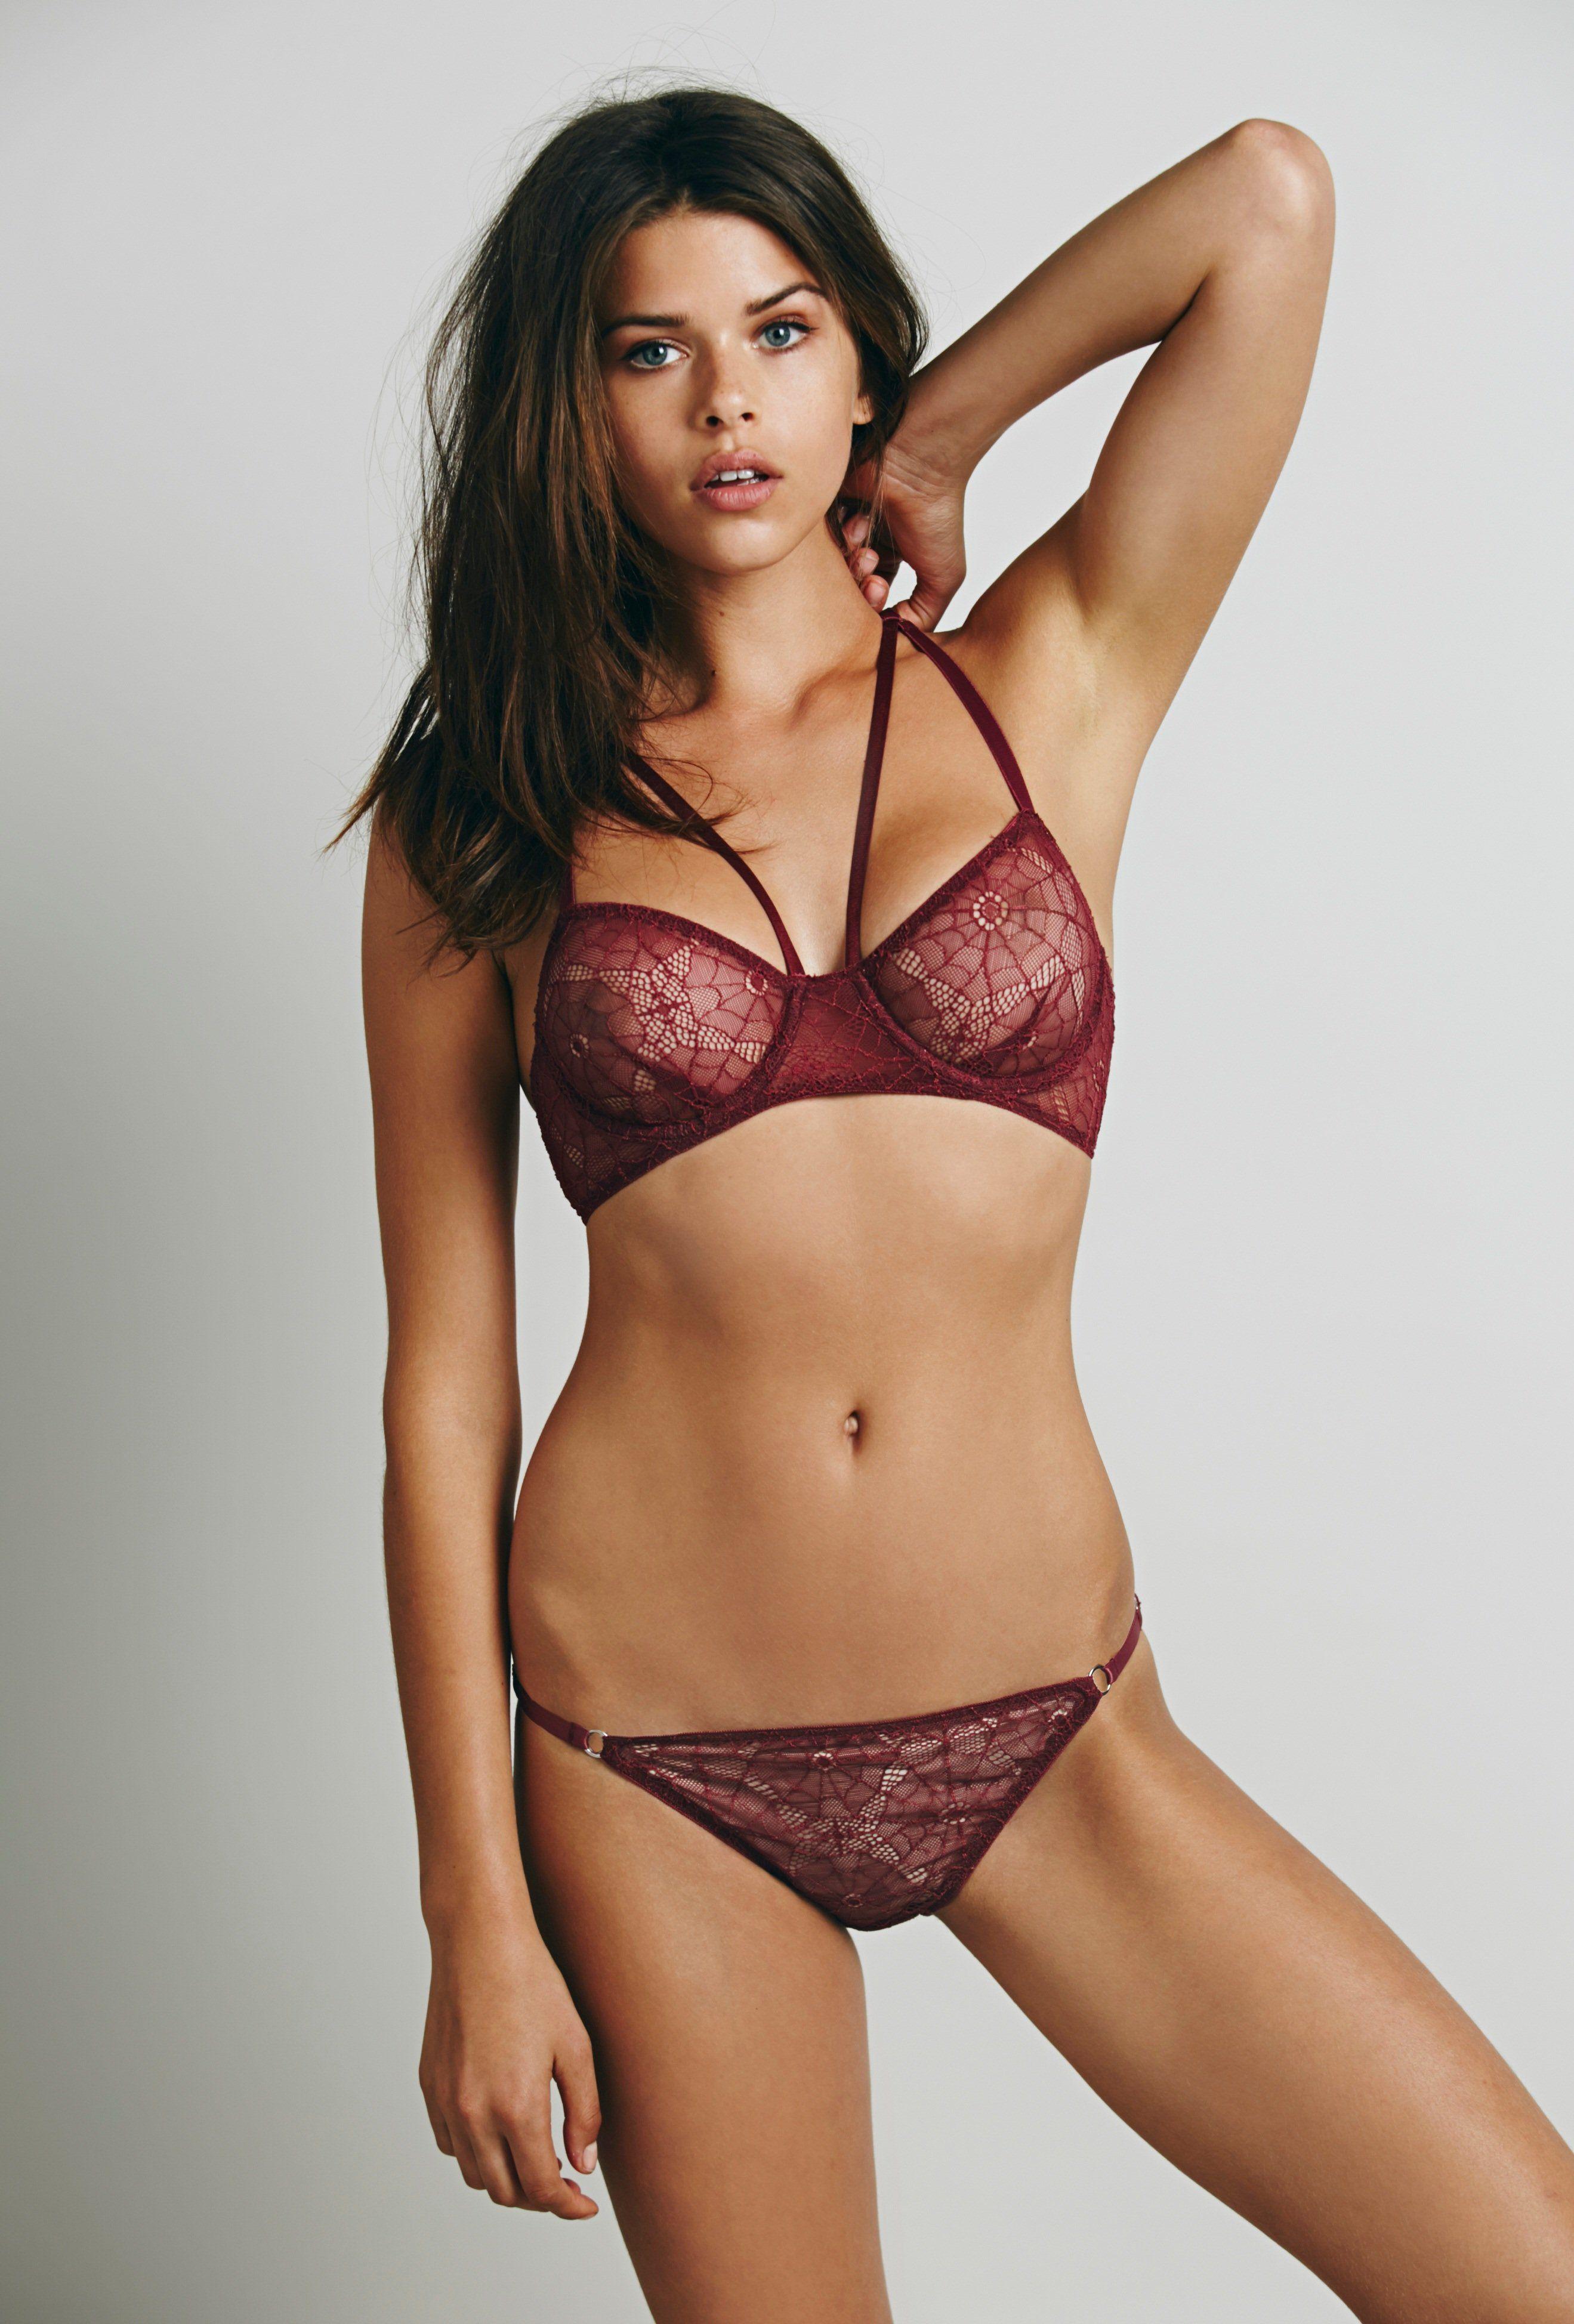 Georgia fowler sexy photos nudes (93 photo)